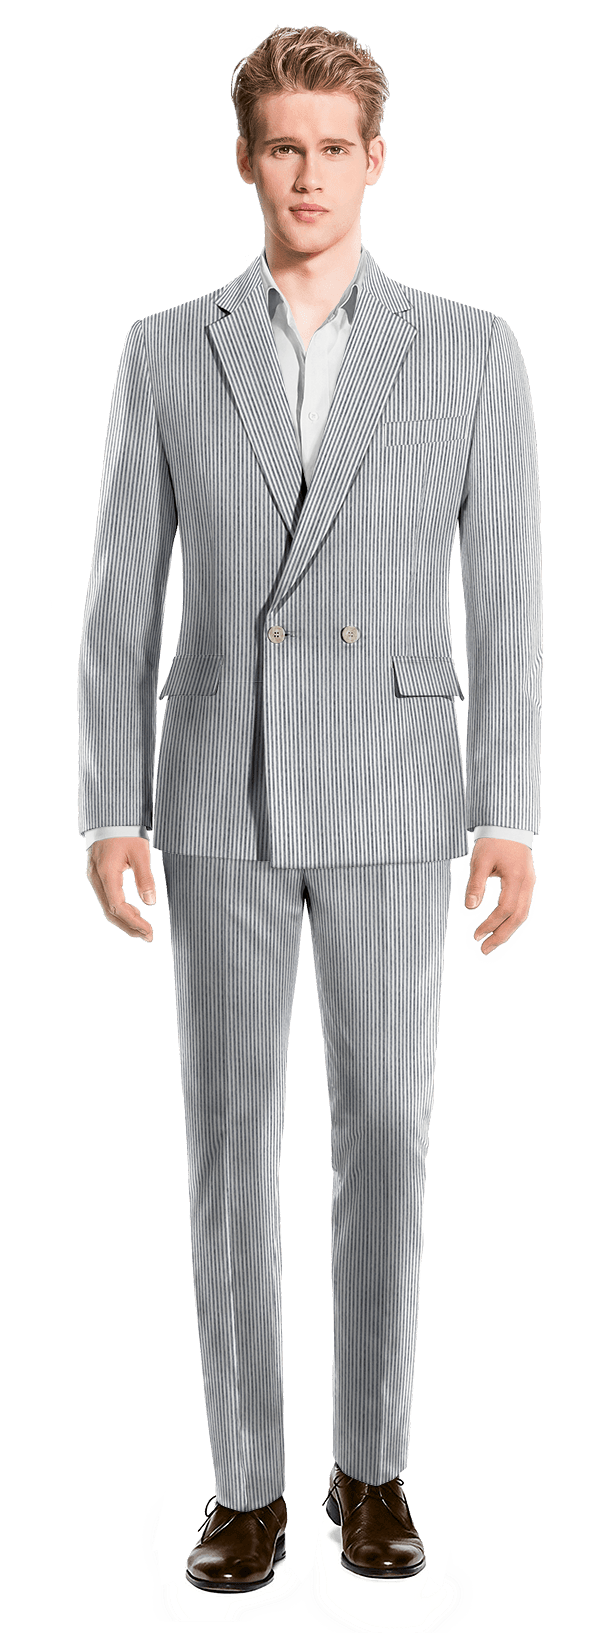 Blue Double breasted striped seersucker Suit £209 - Salley ...